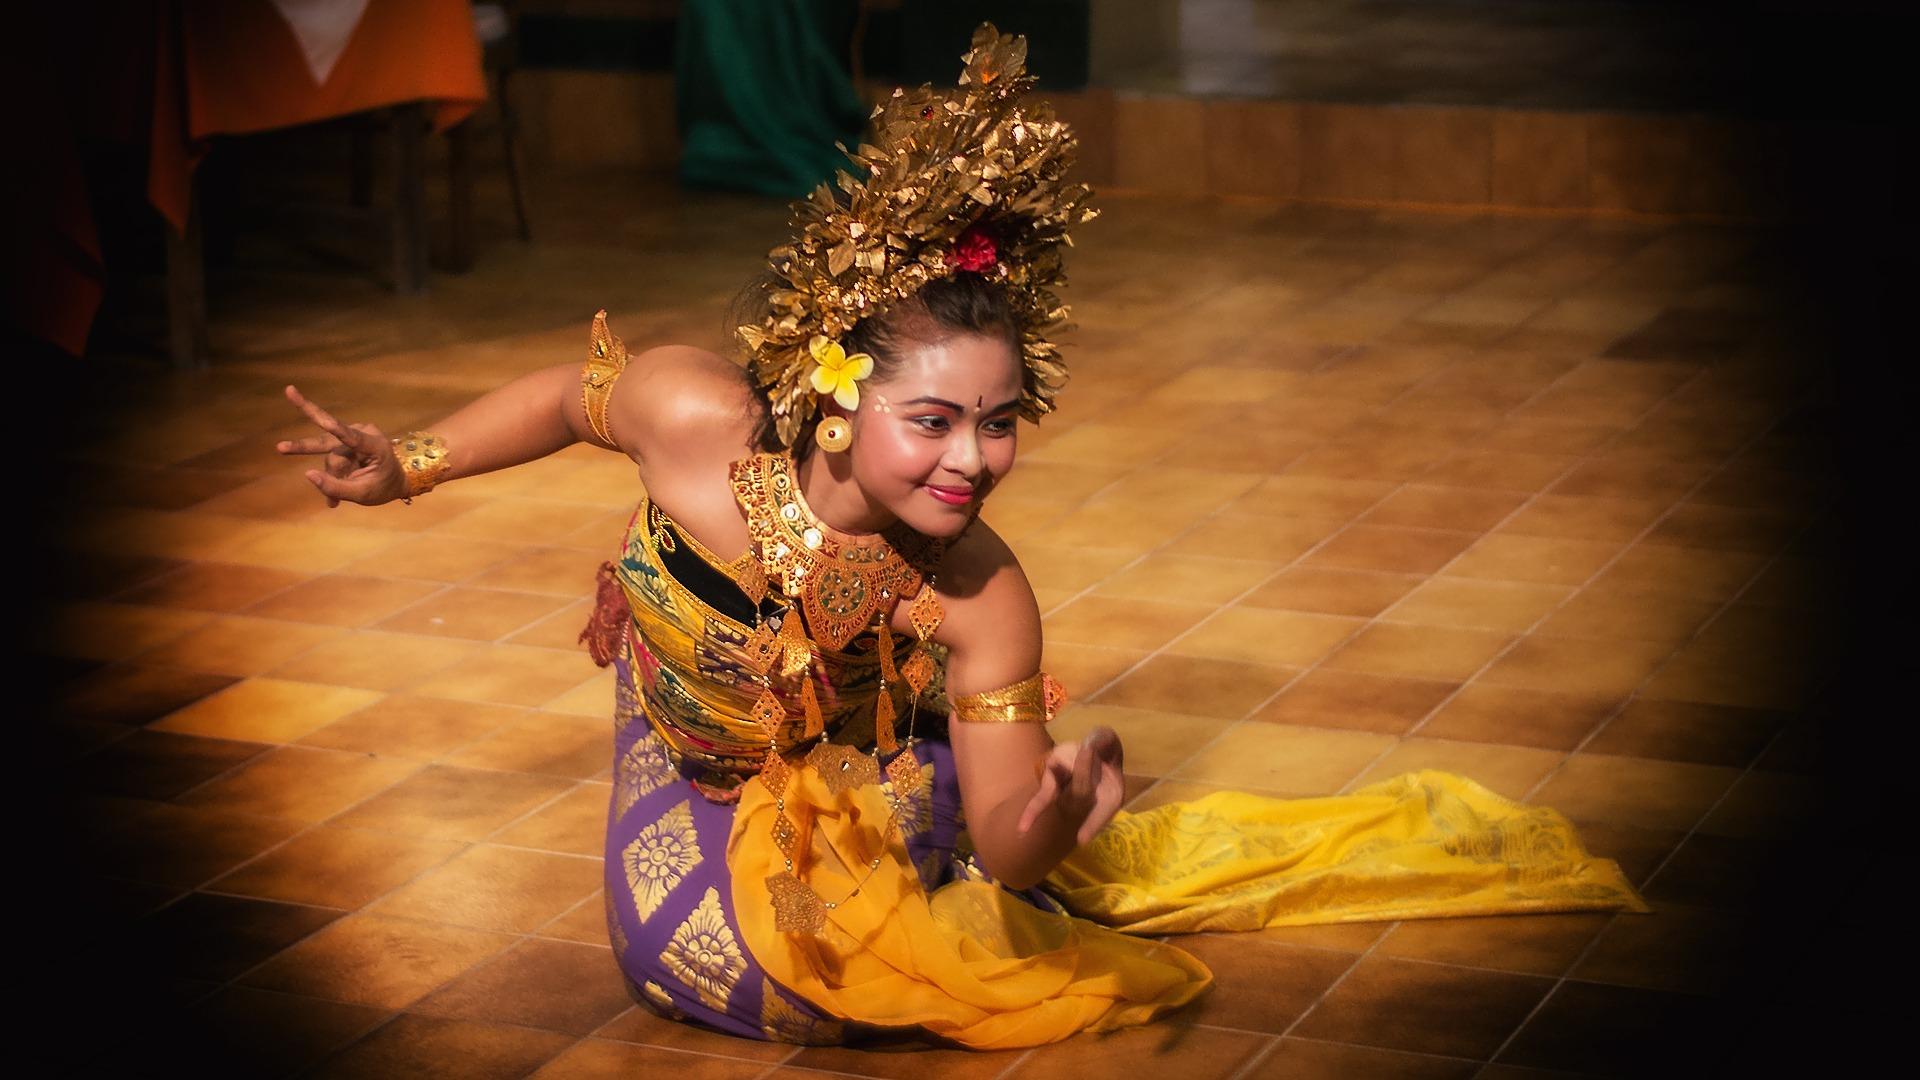 bali frau legong - Bali: Island of many dances